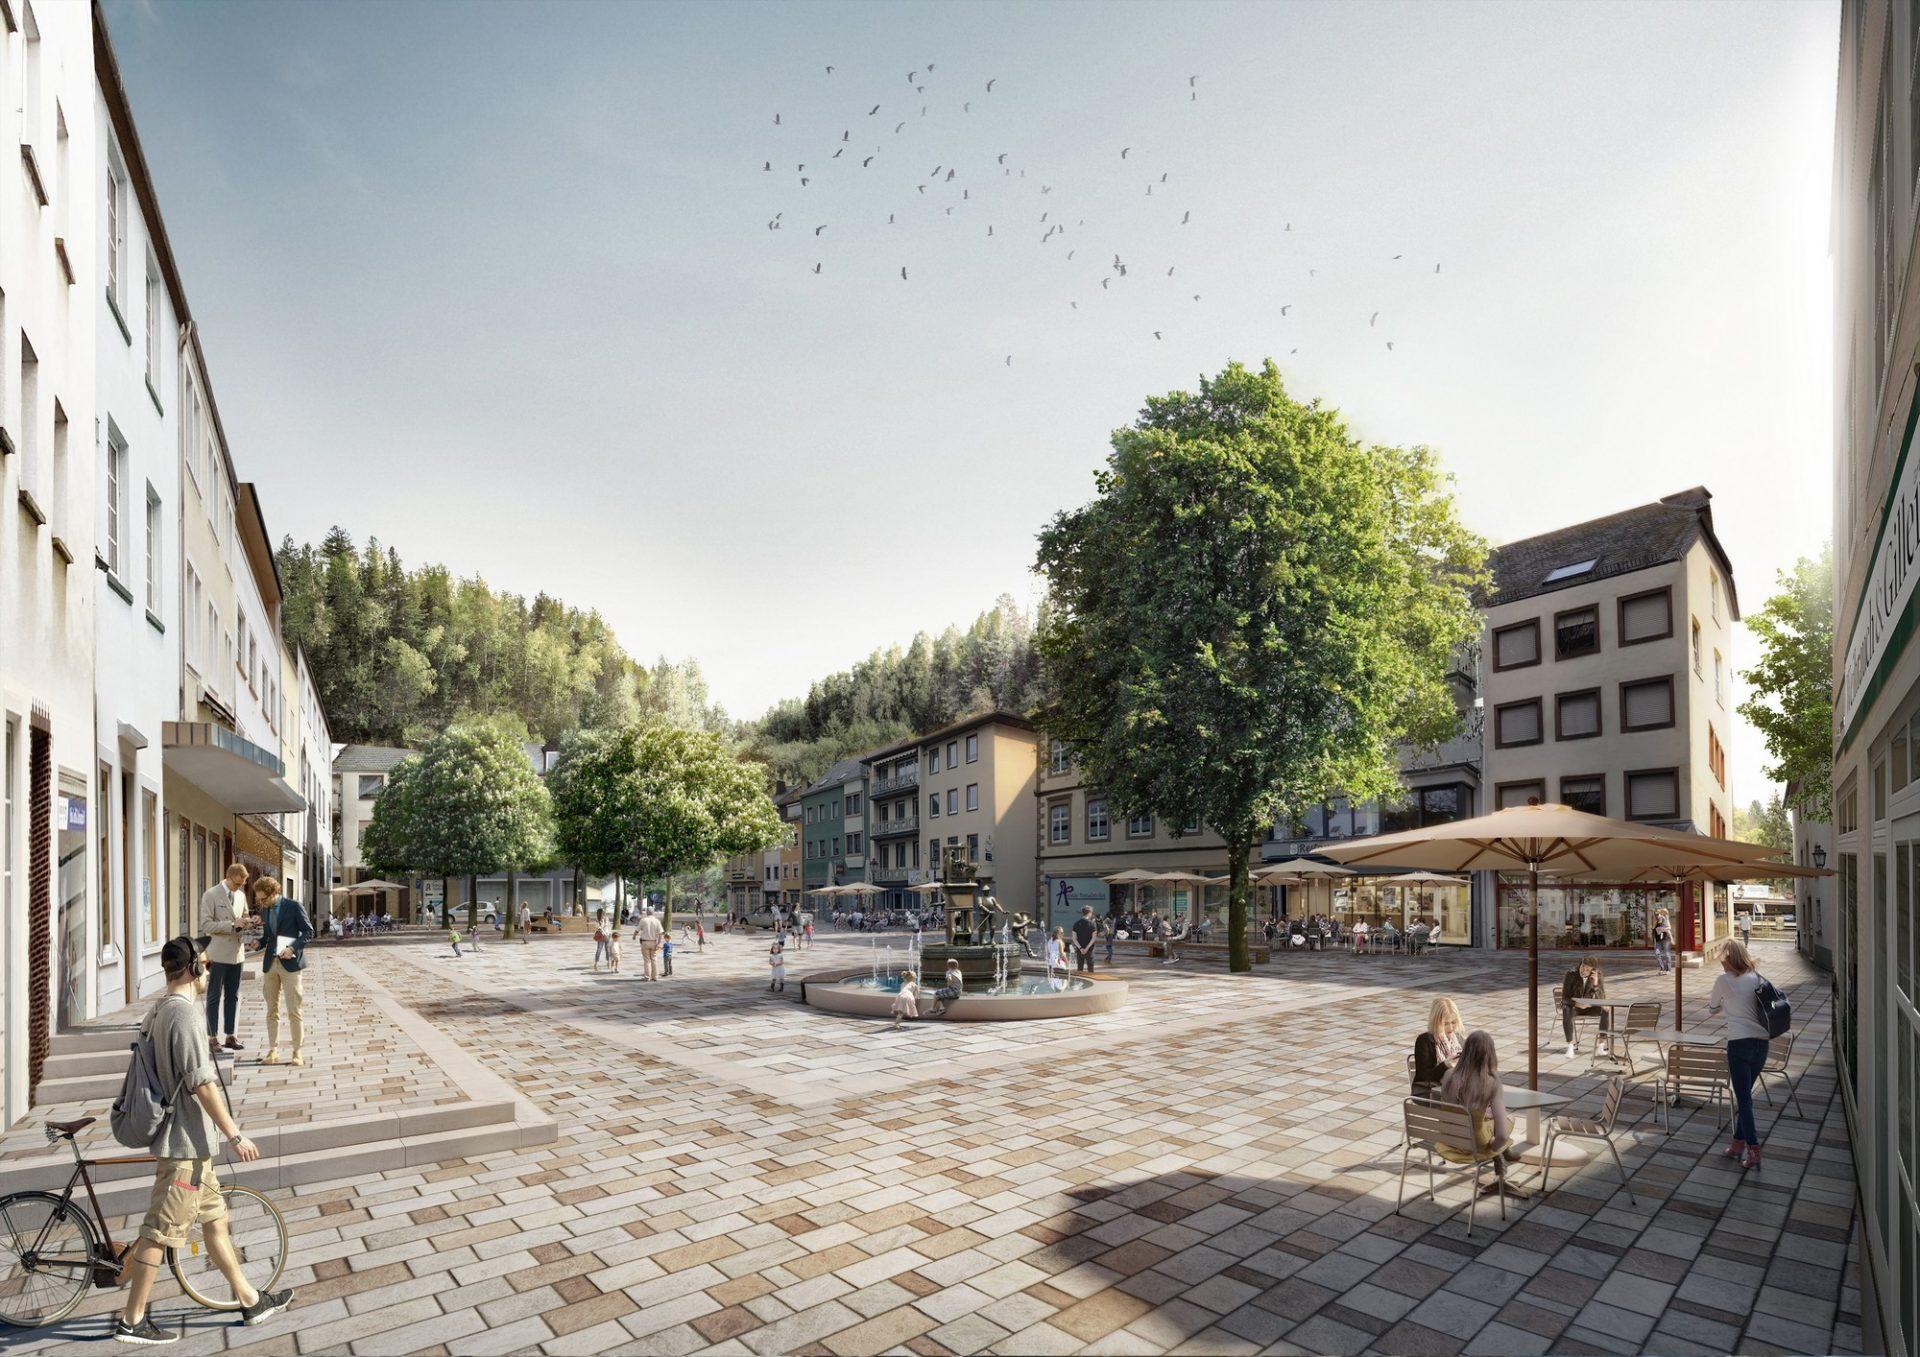 Neuerburg Marktplatz